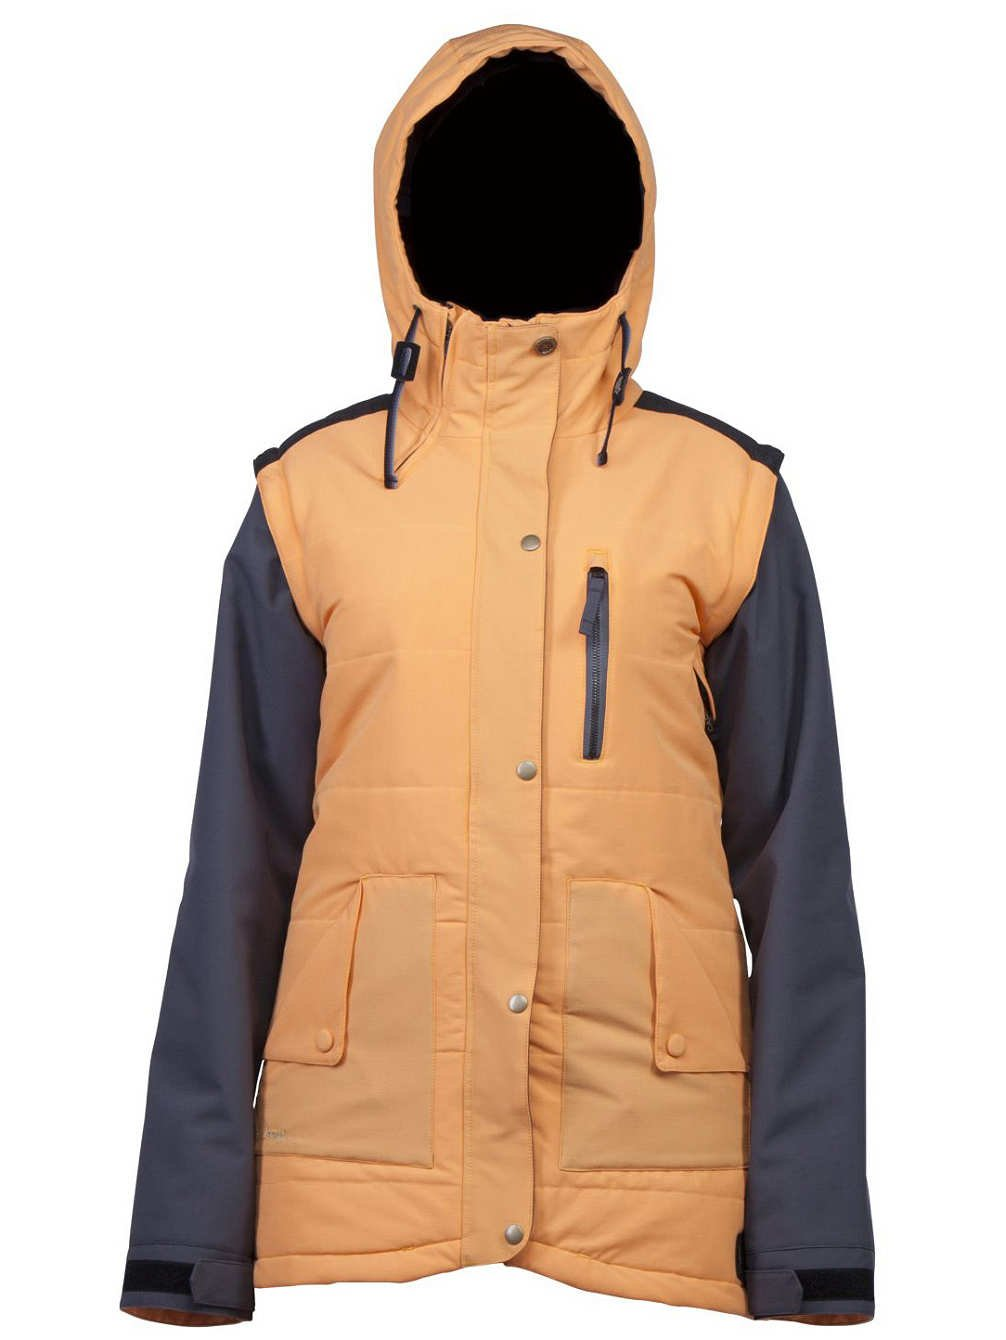 Damen Snowboard Jacke Cappel Road To Ruin Jacket kaufen